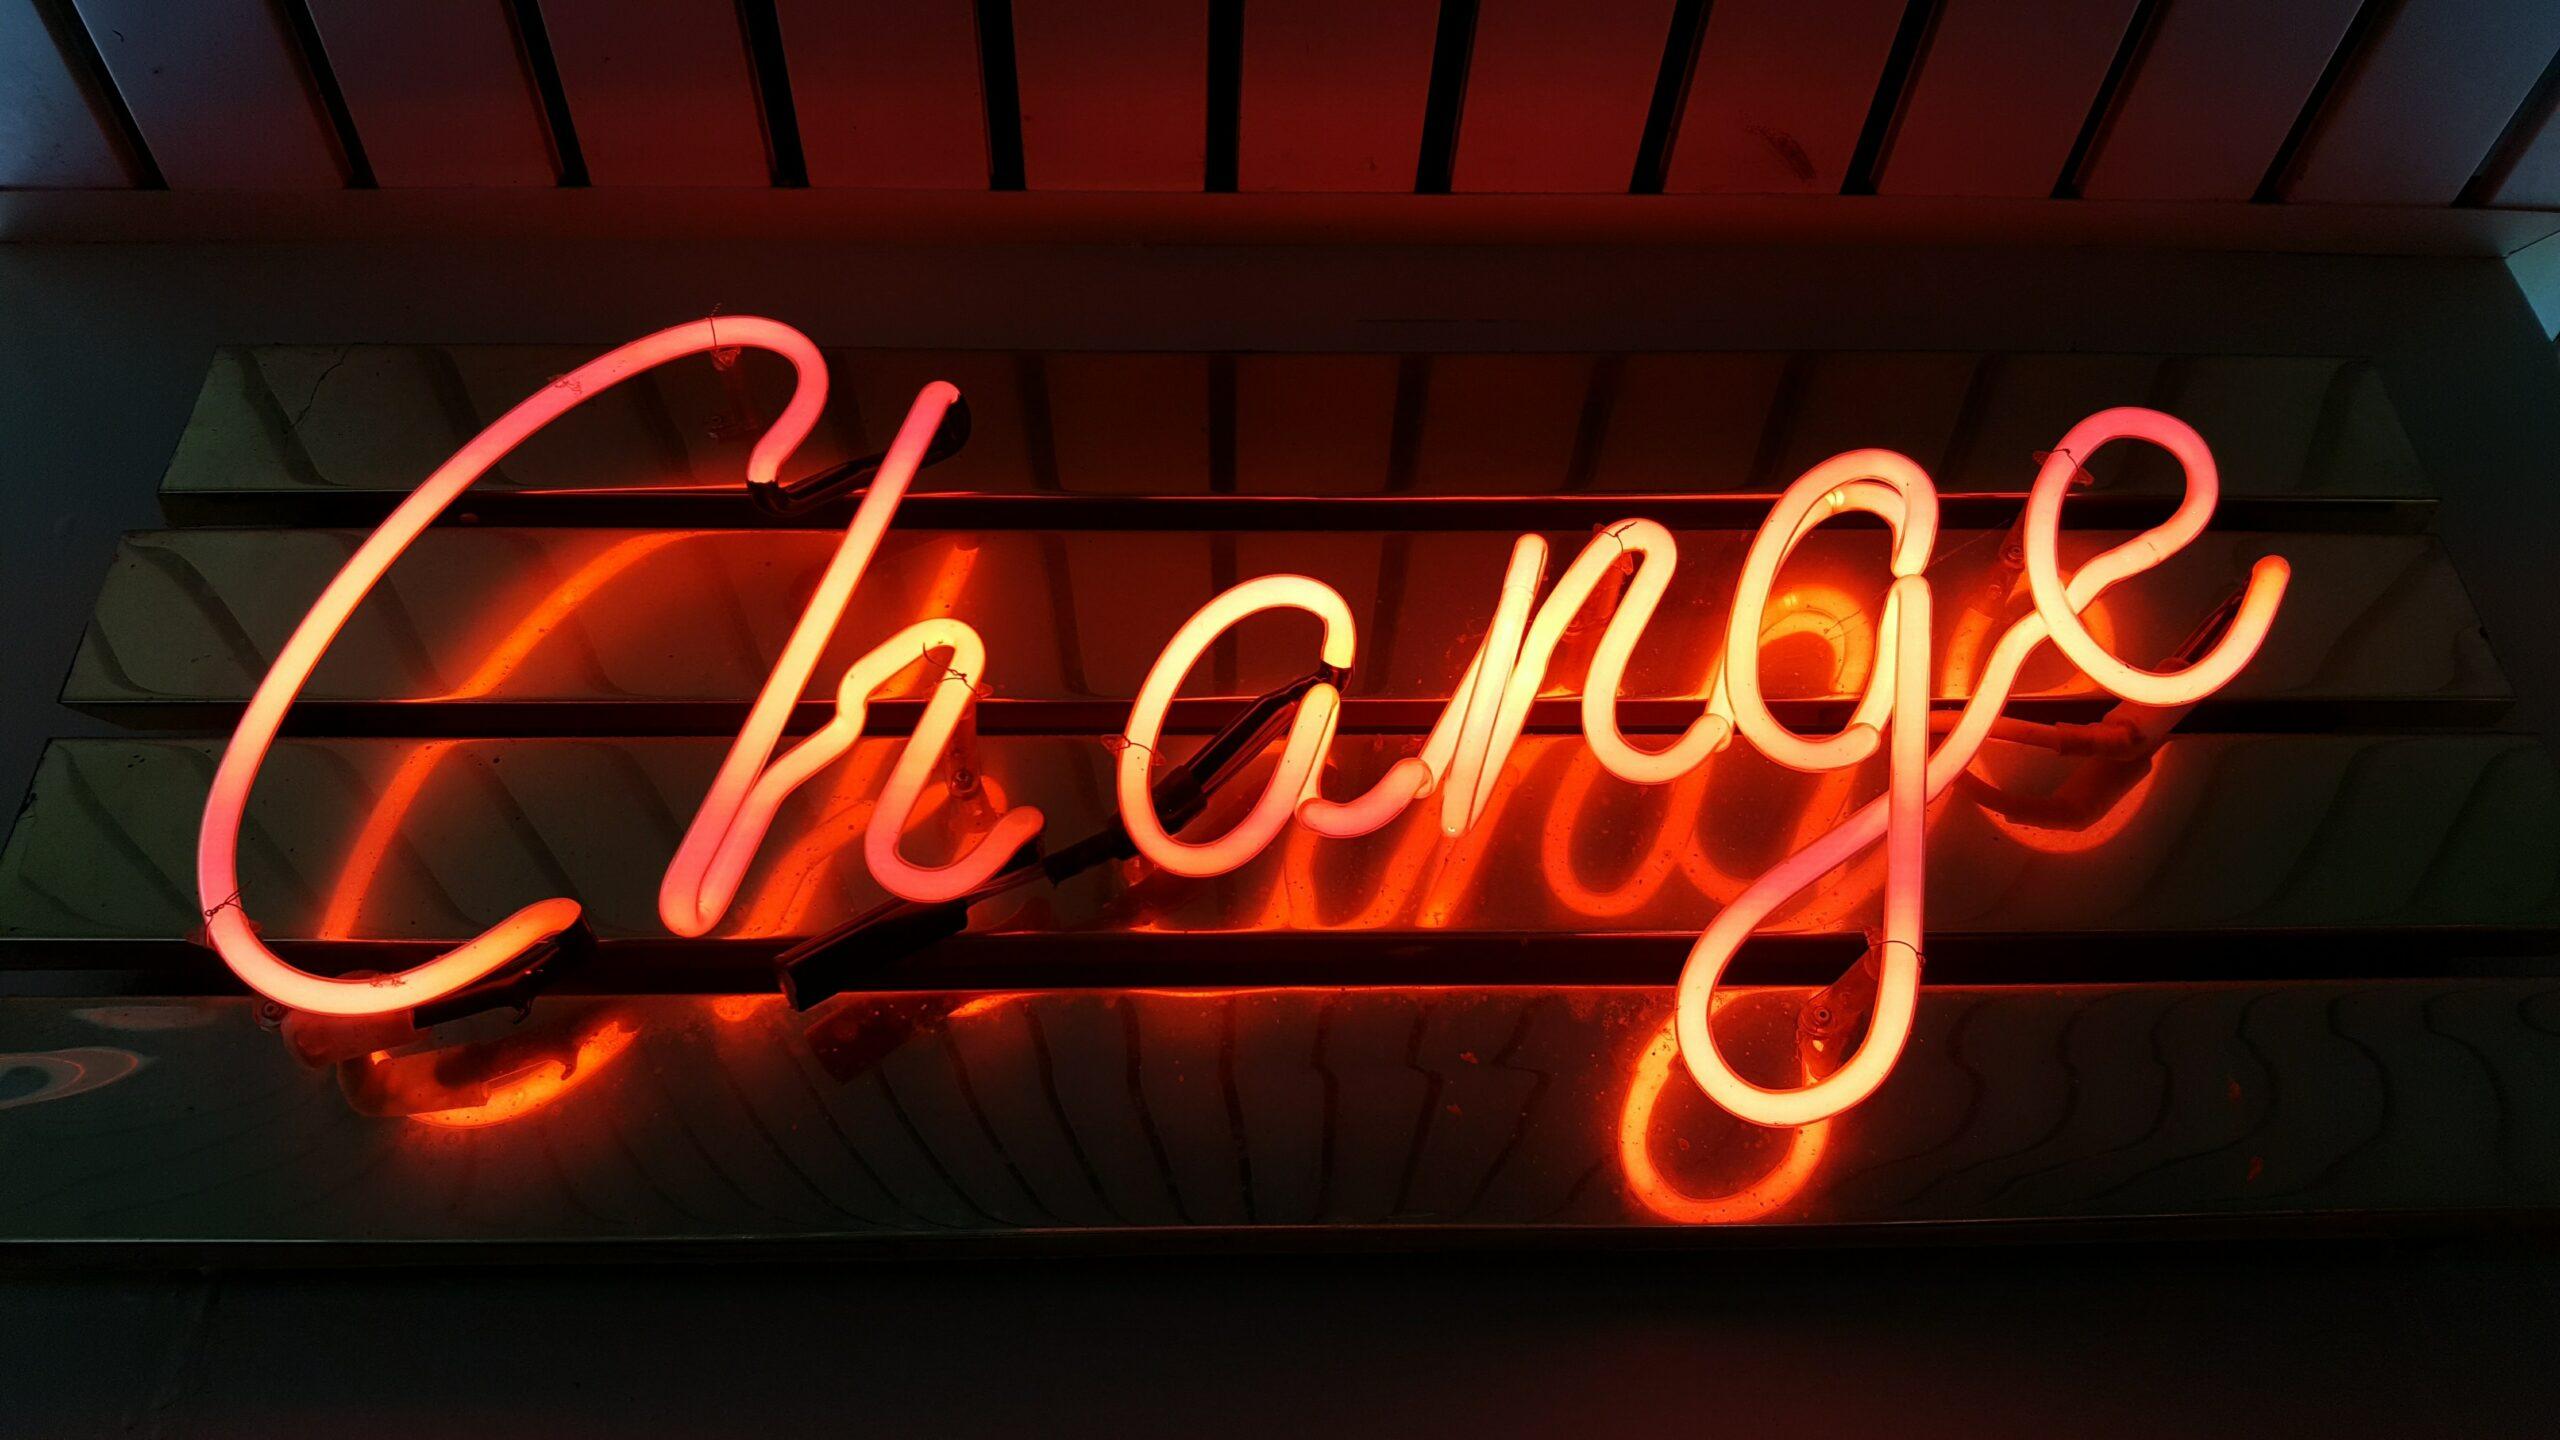 Change neon